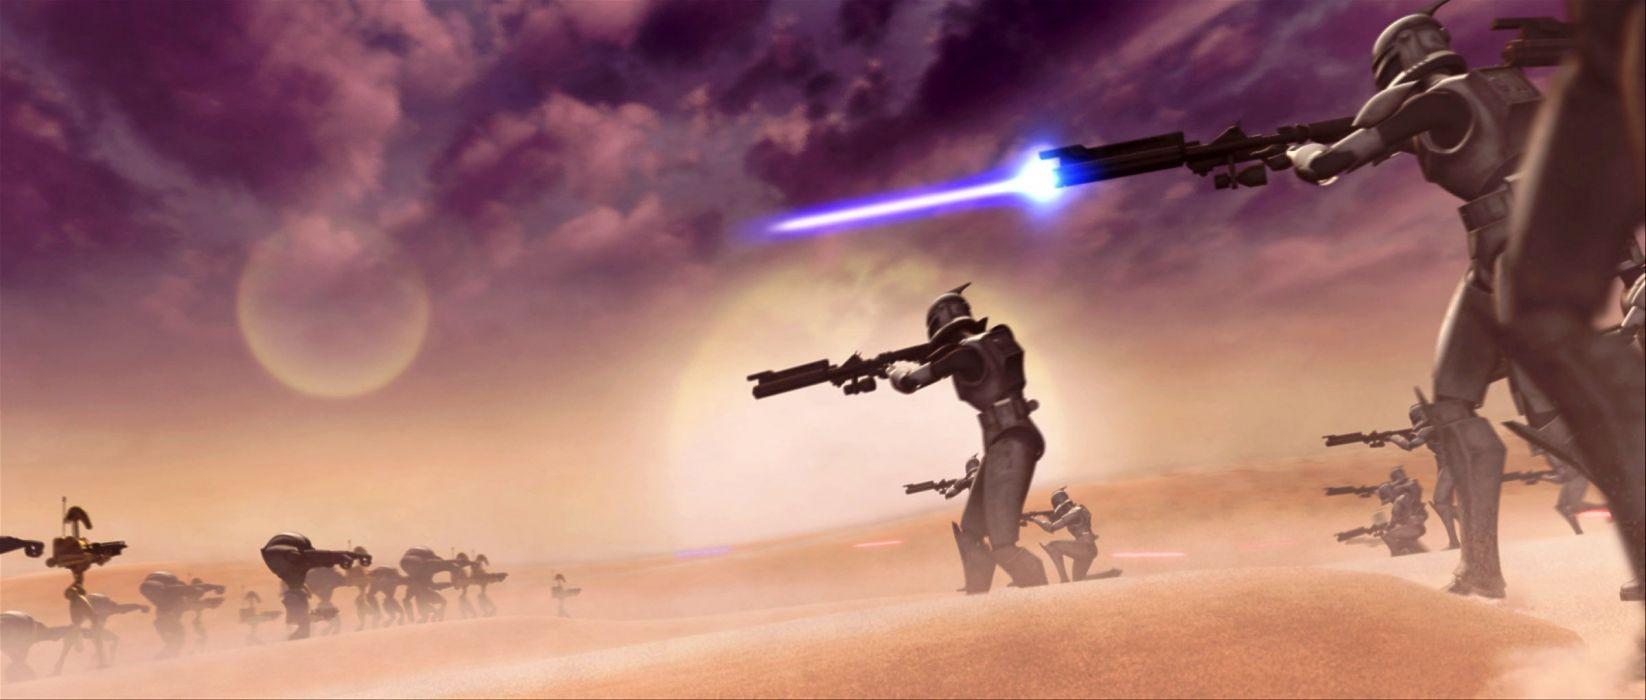 STAR WARS CLONE WARS animation sci-fi cartoon futuristic television clones series (16) wallpaper